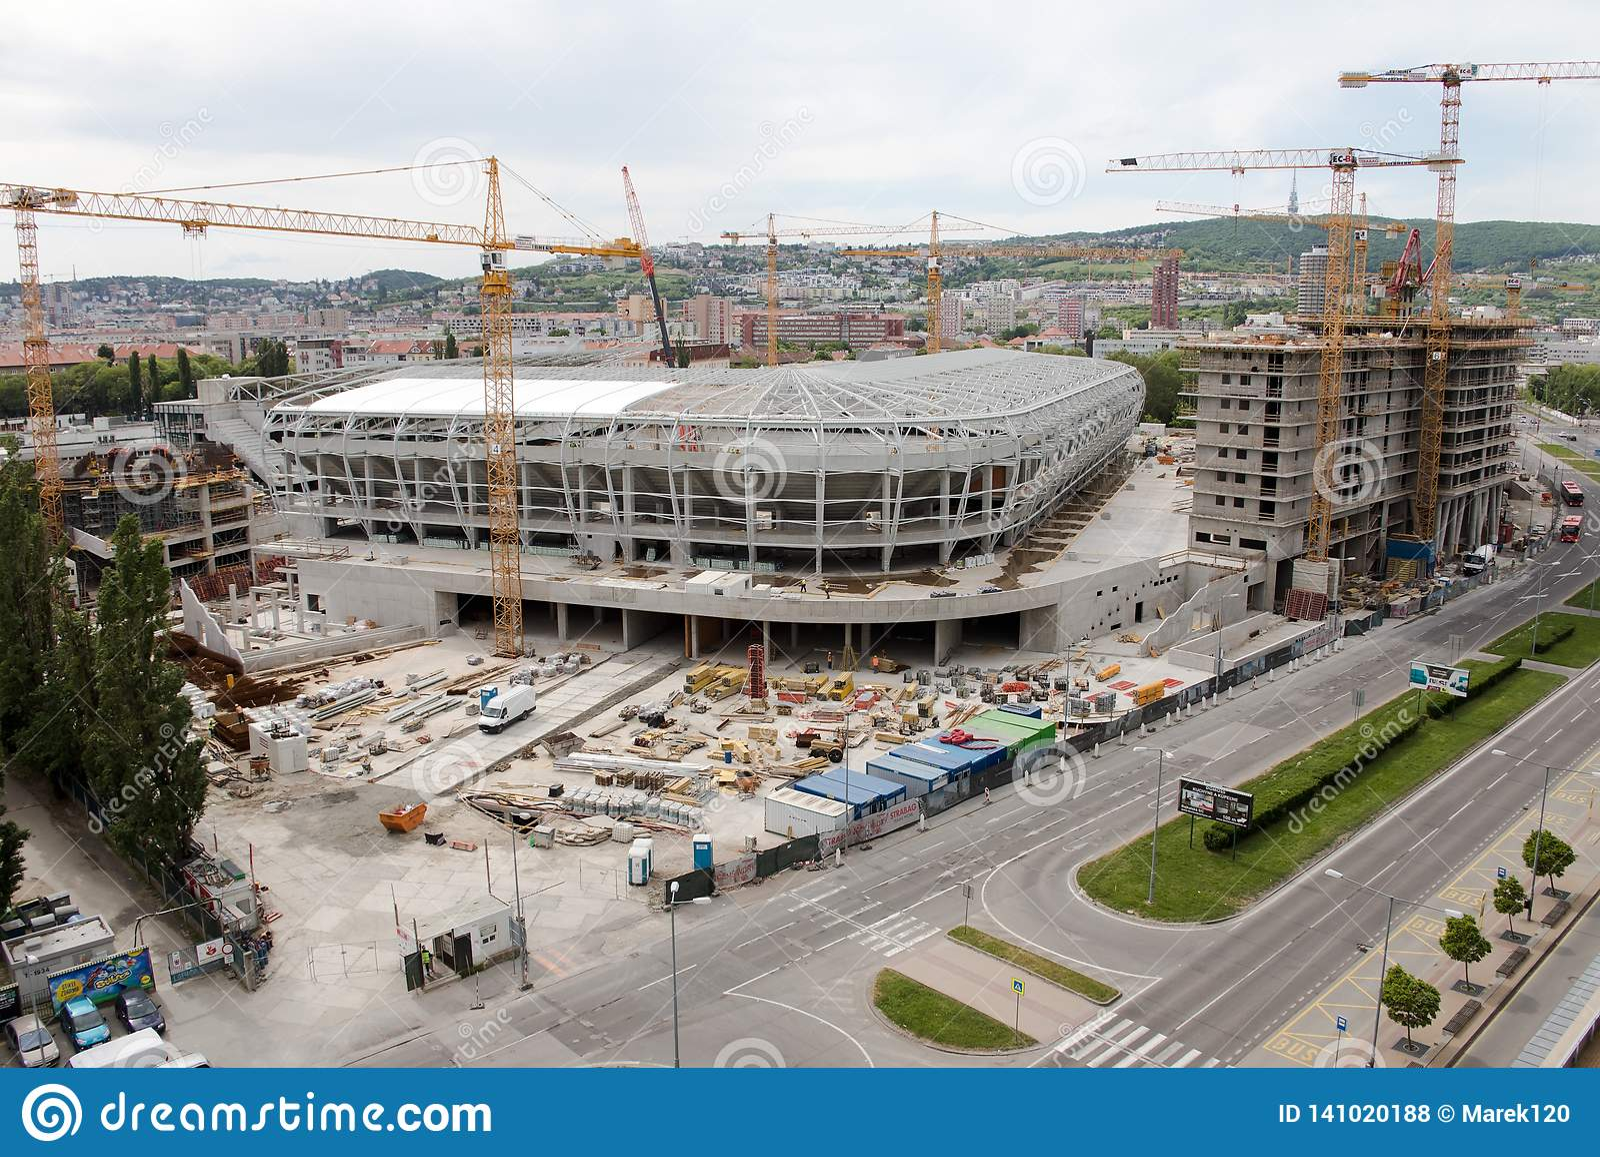 Bratislava, Slovaquie - 1er mai 2018 - établir un nouveau stade de football